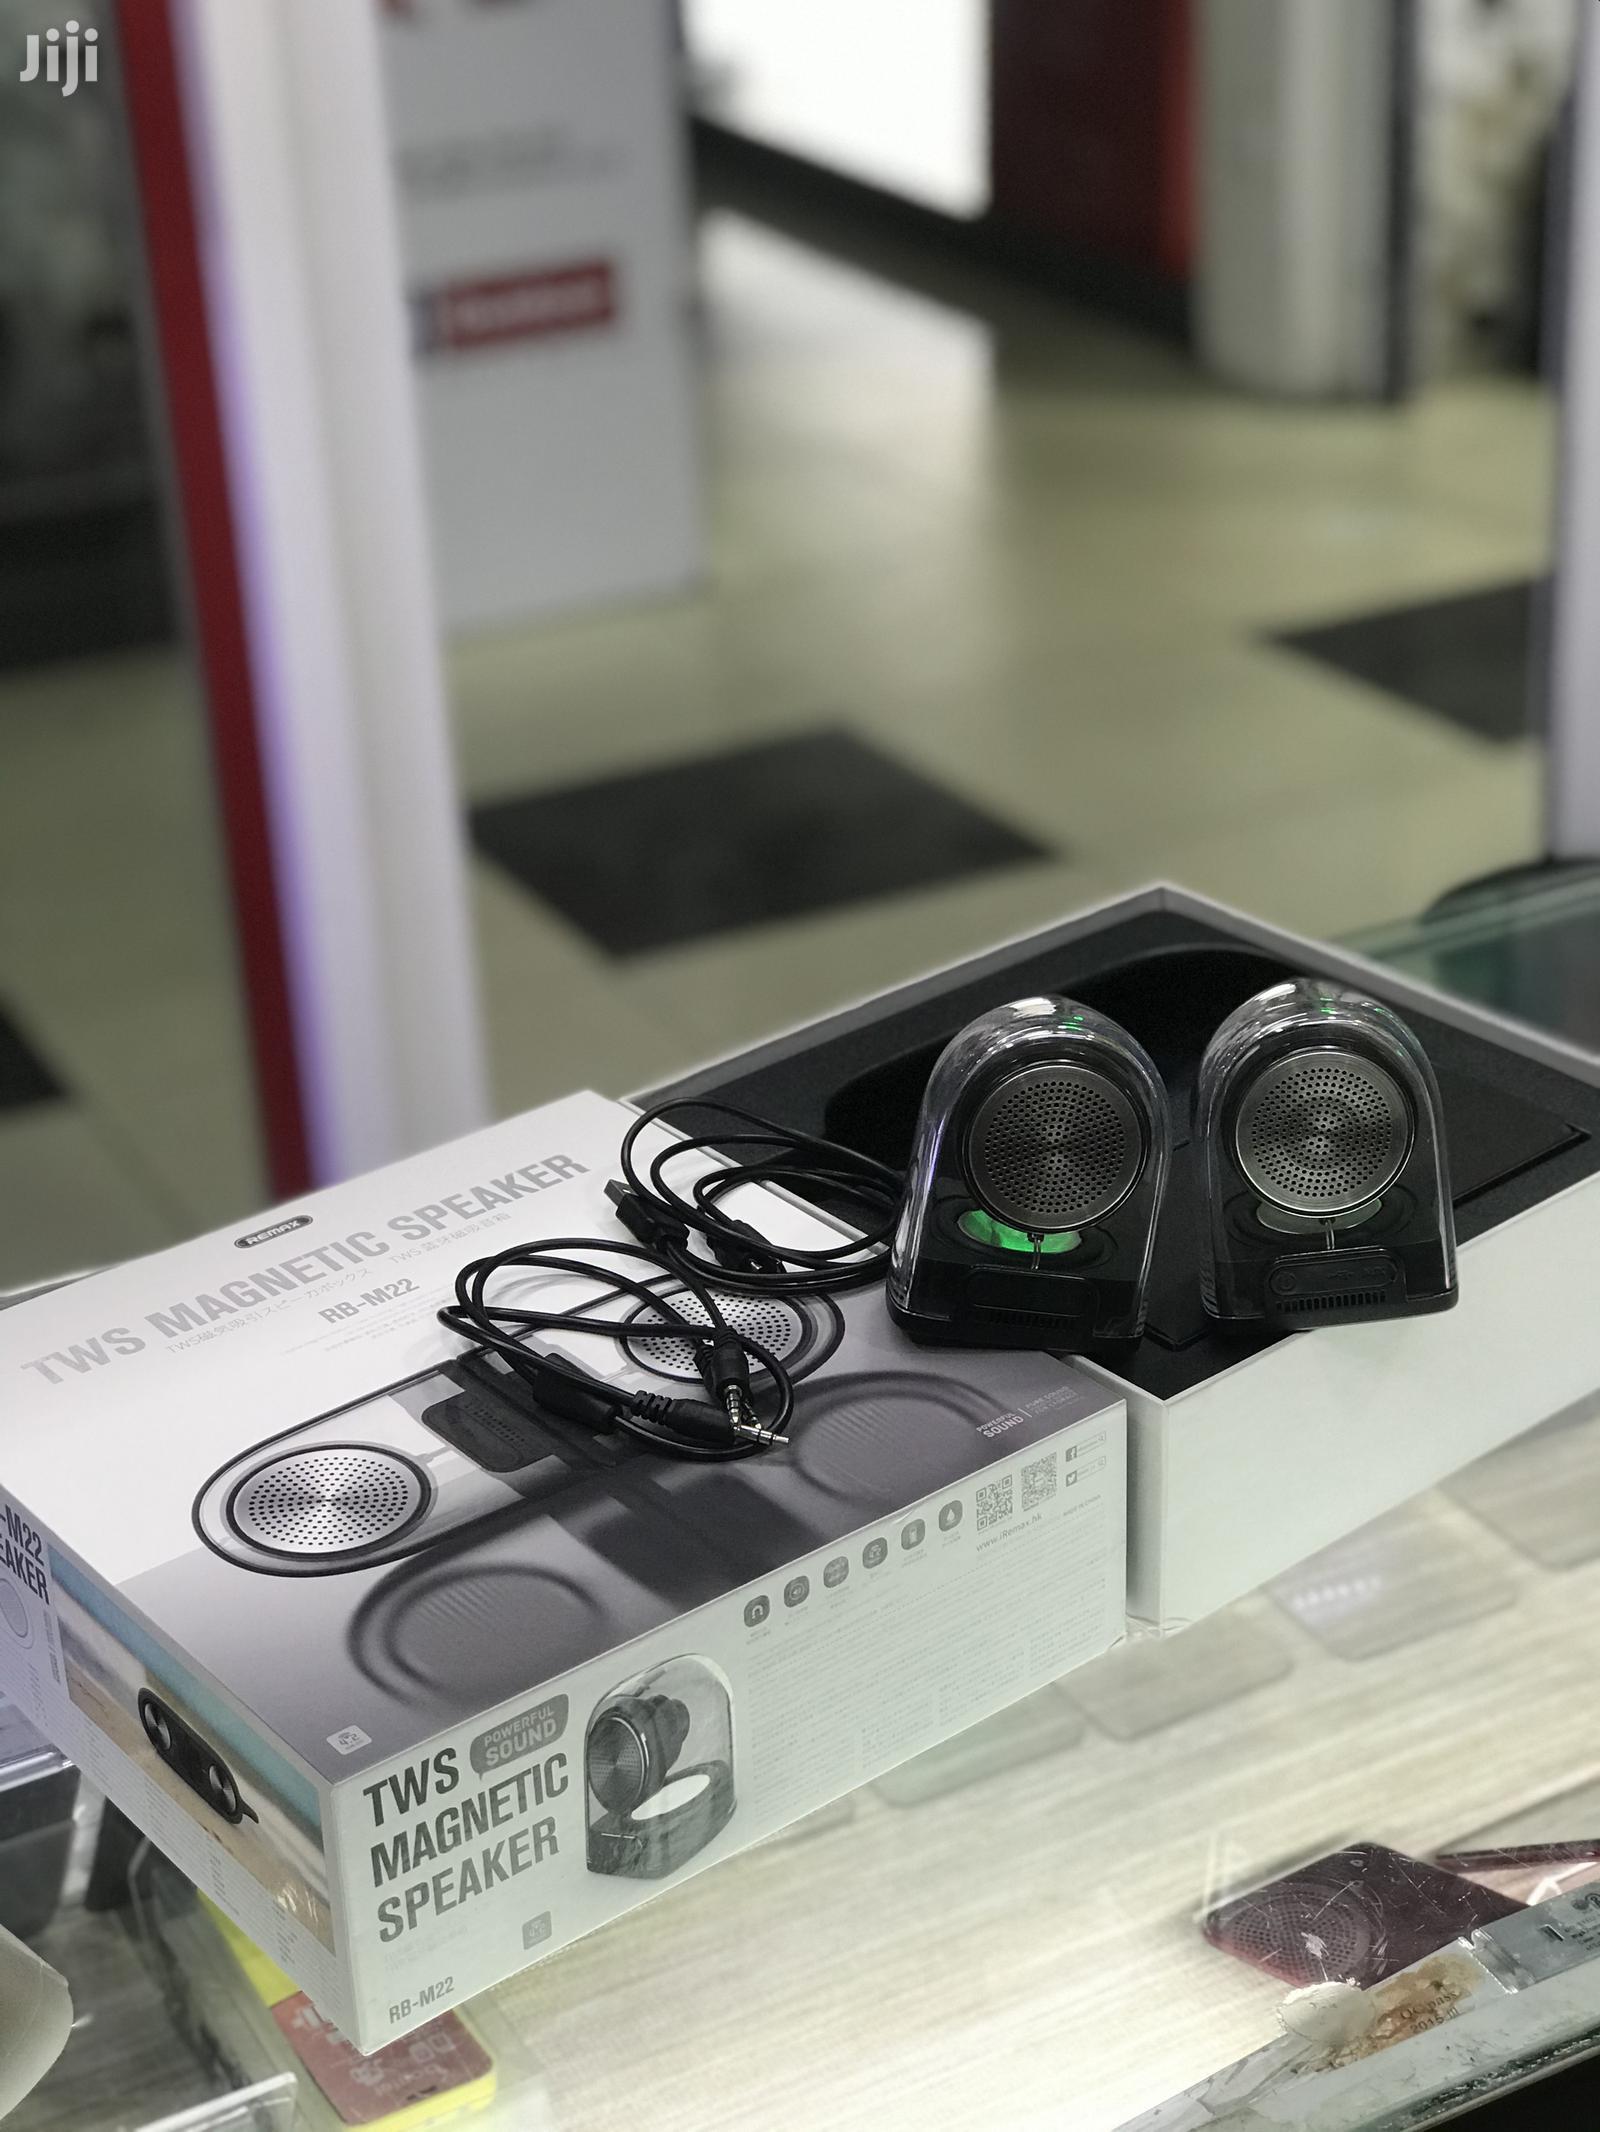 Remax Rb-m22 TWS Magnetic Wireless Bluetooth Speaker